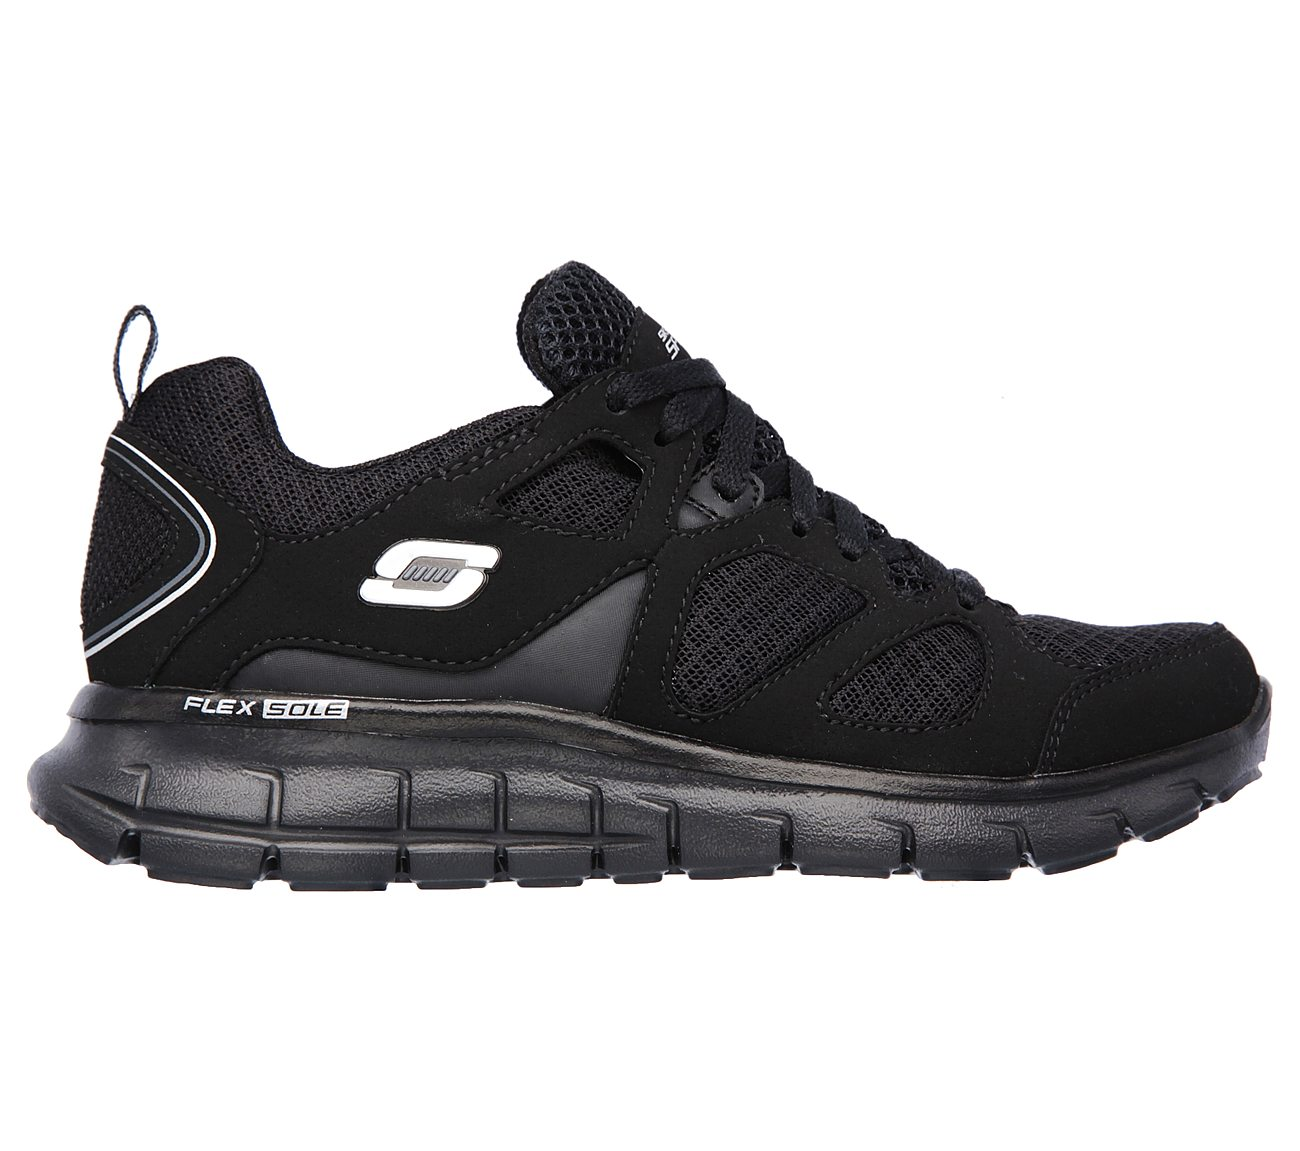 9a2443e06e4c Buy SKECHERS VIM - TURBO RIDE Shoes only £29.00